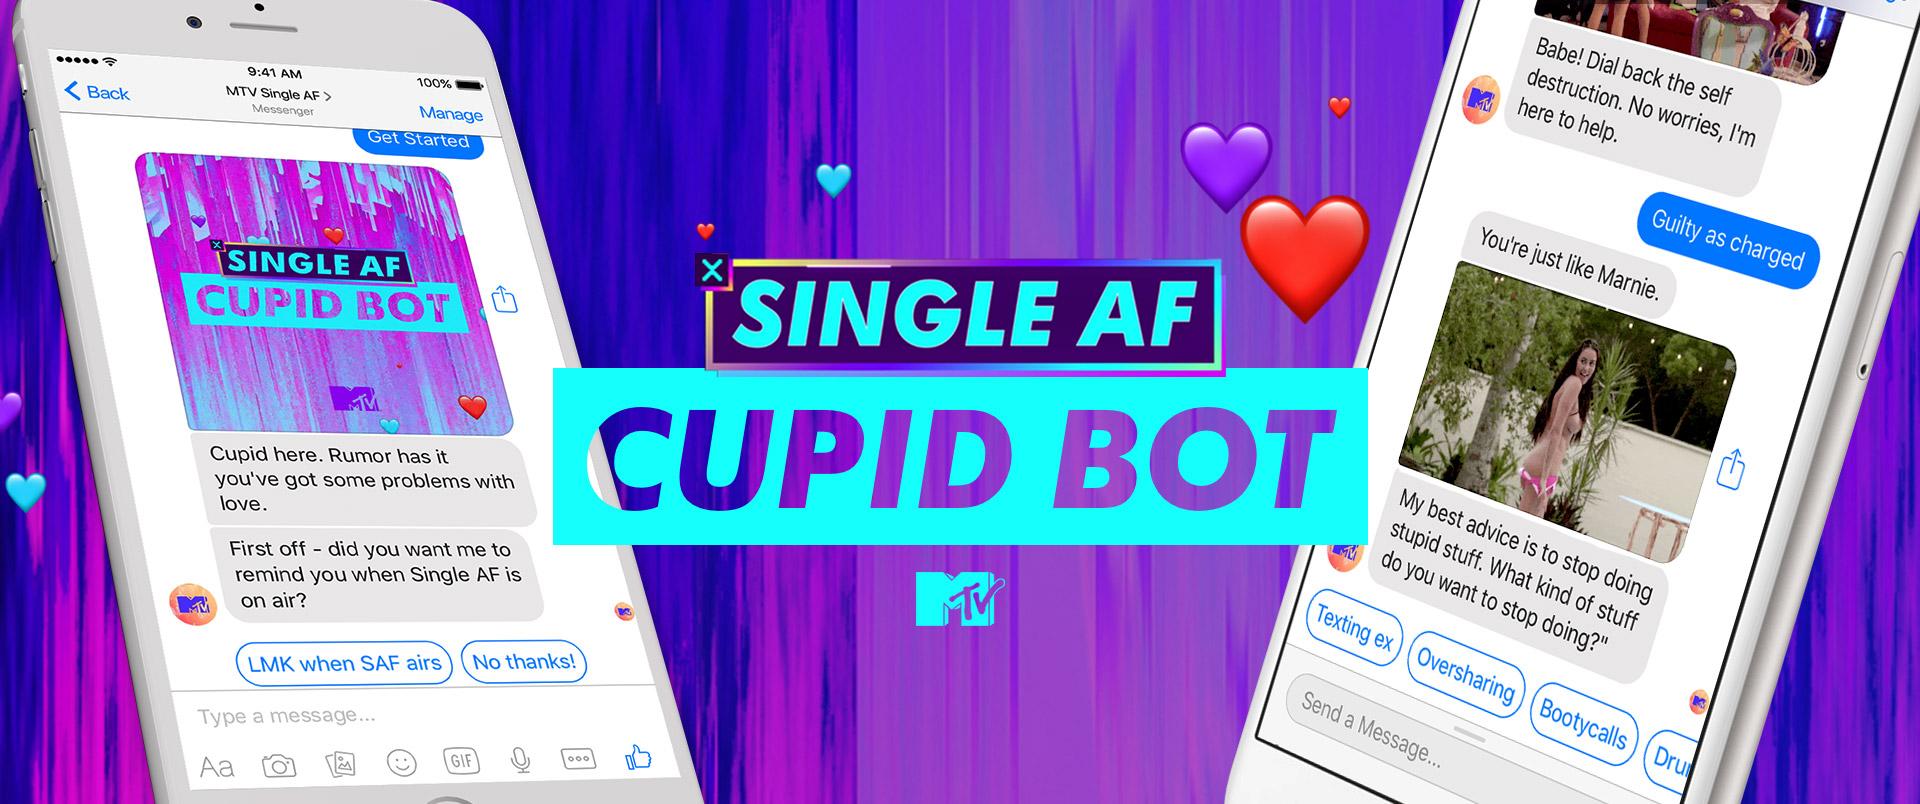 mtv-single-af-cupid-bot-key.jpg